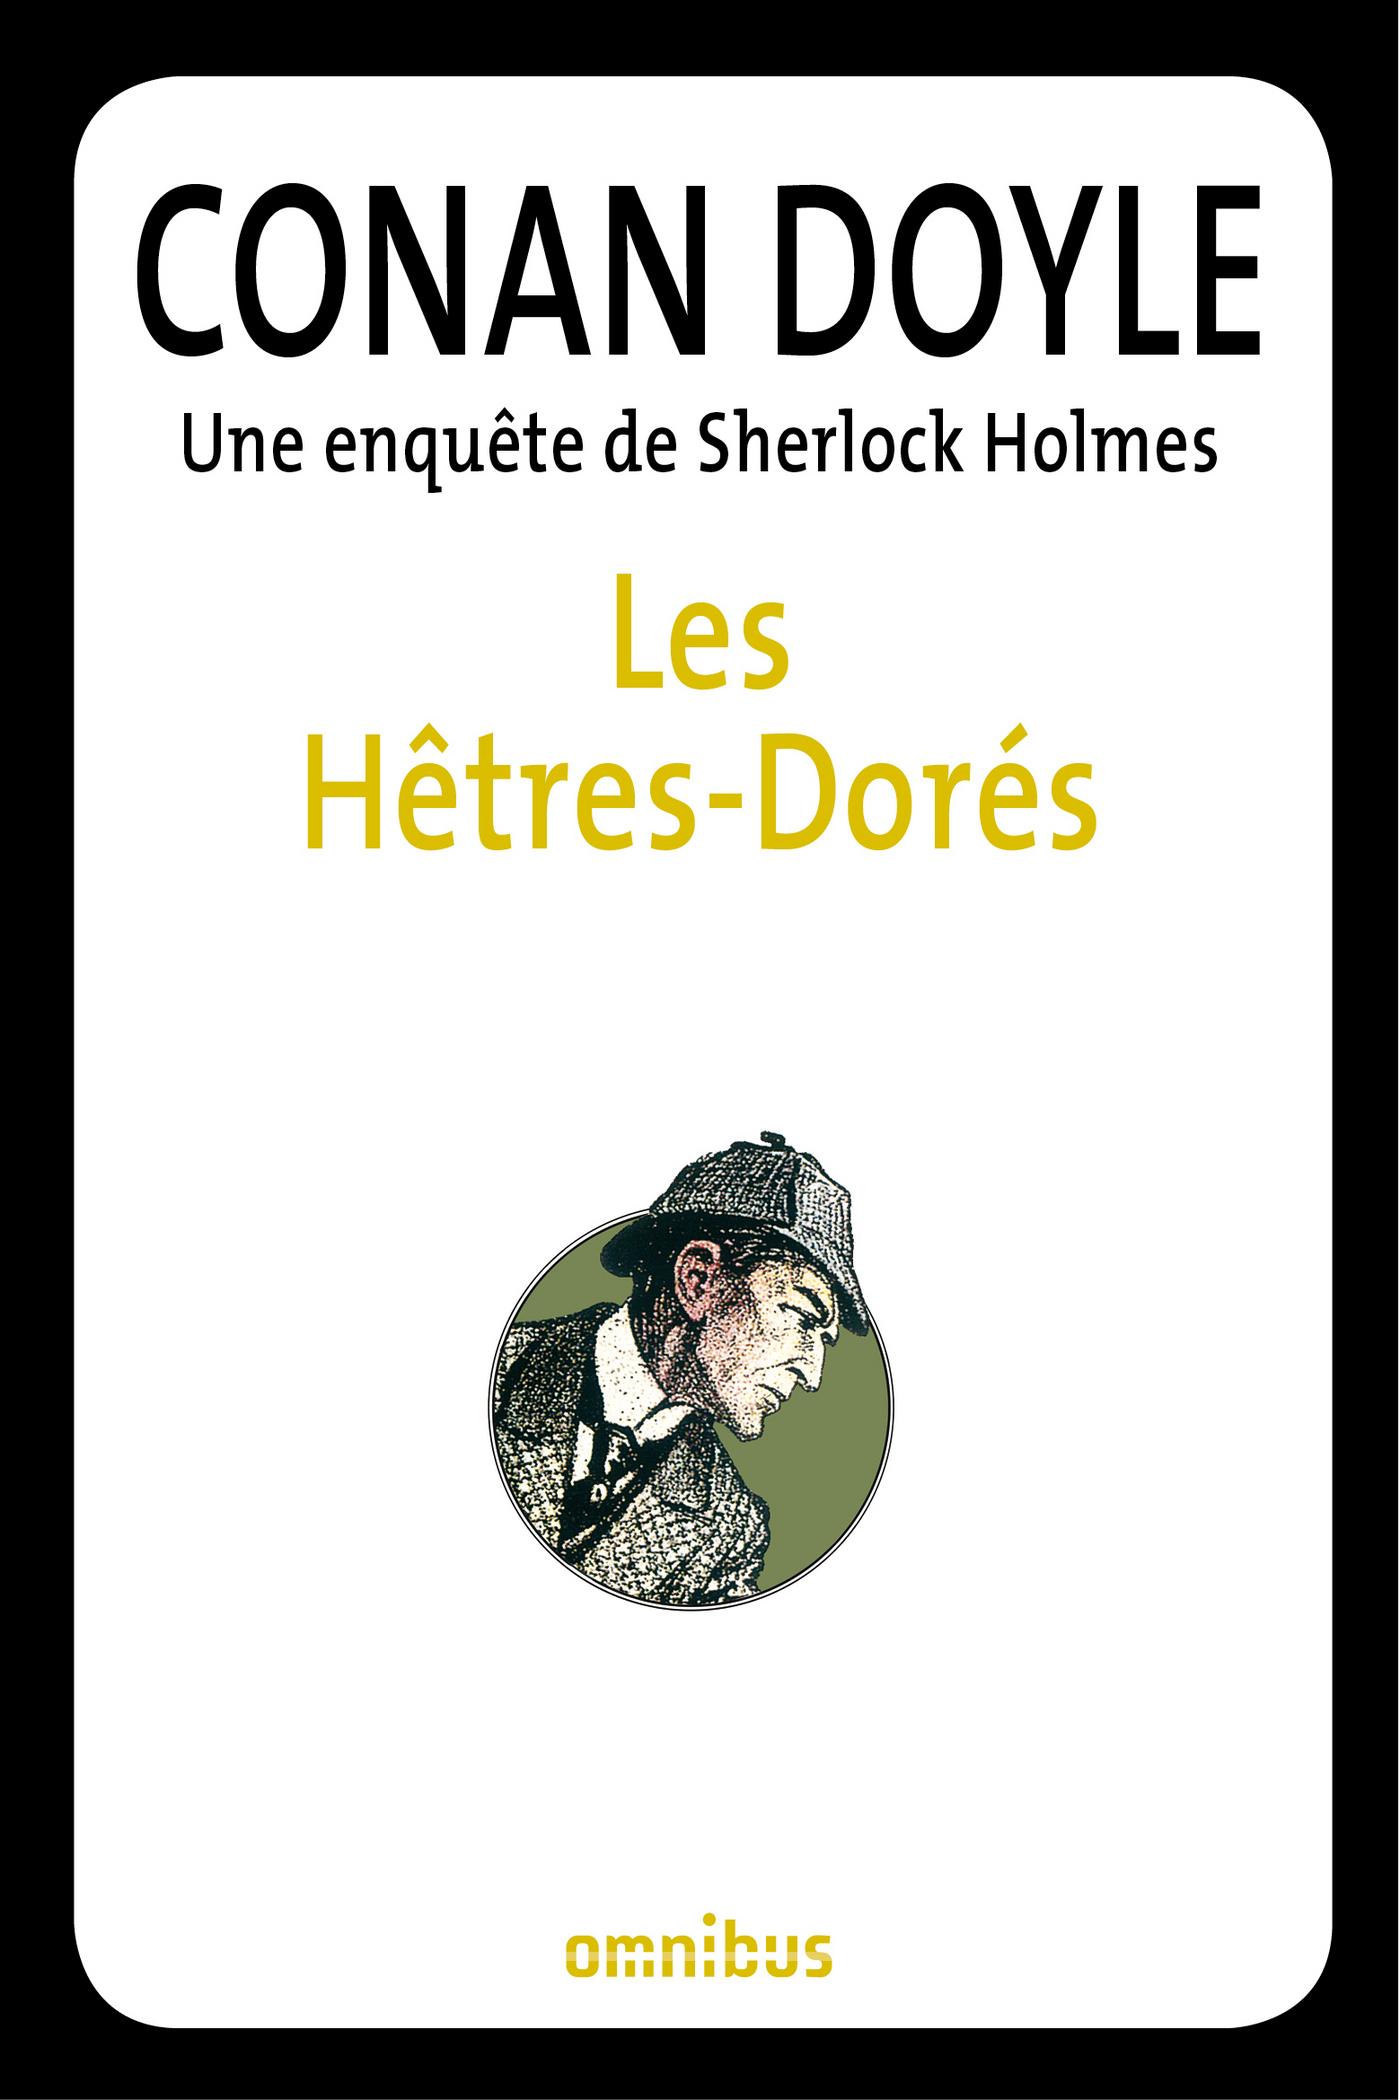 Les Hêtres-Dorés